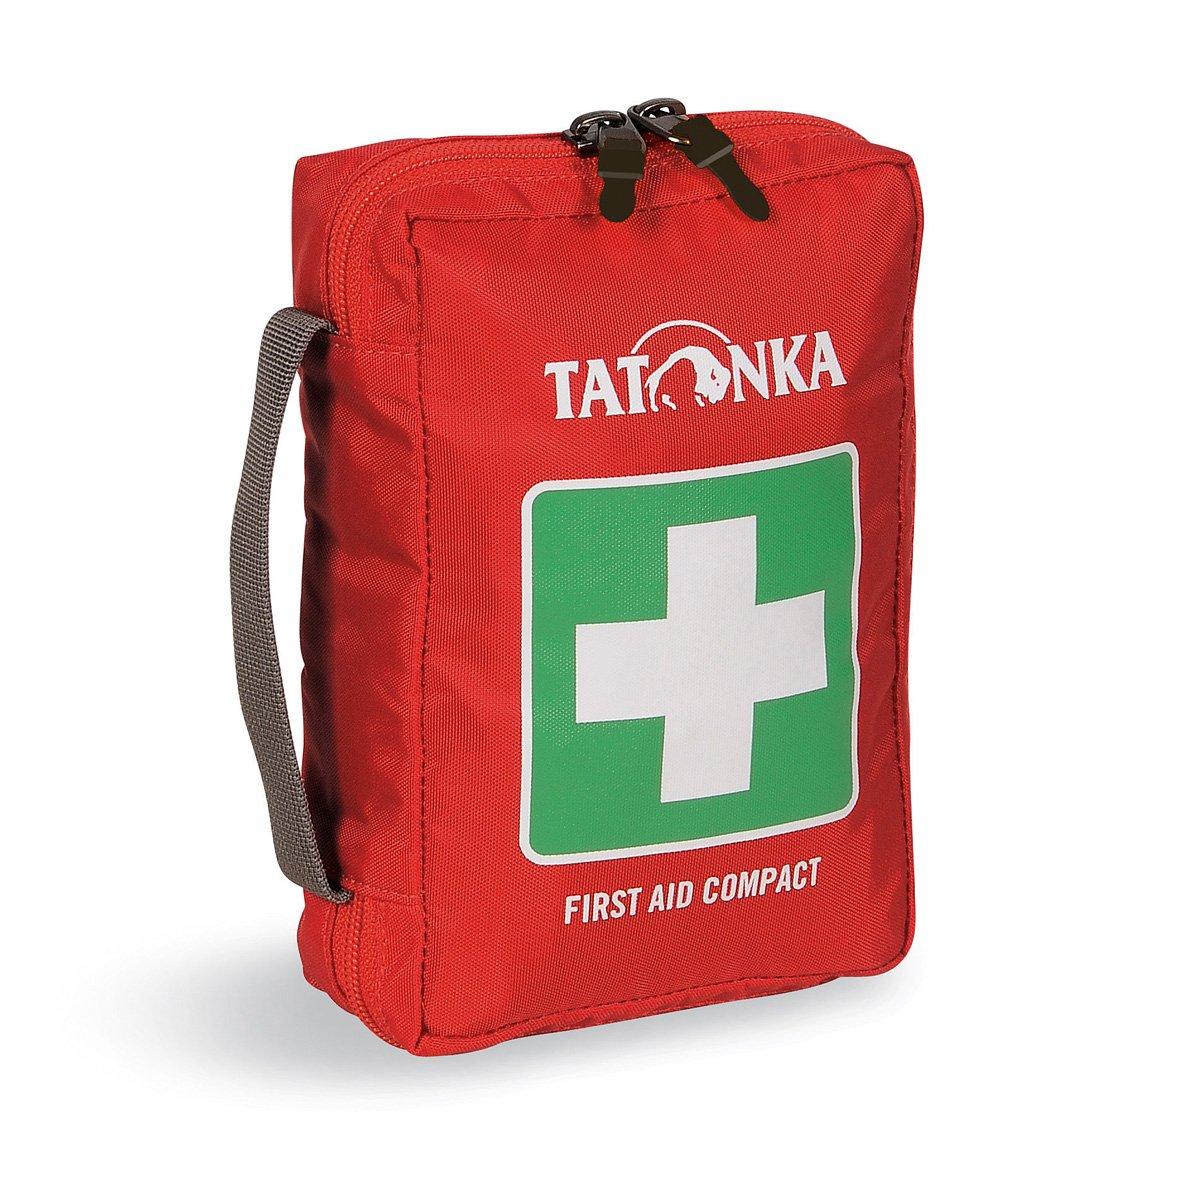 Tatonka Erste Hilfe First Aid Compact, ROT, 18 x 12,5 x 5,5 cm